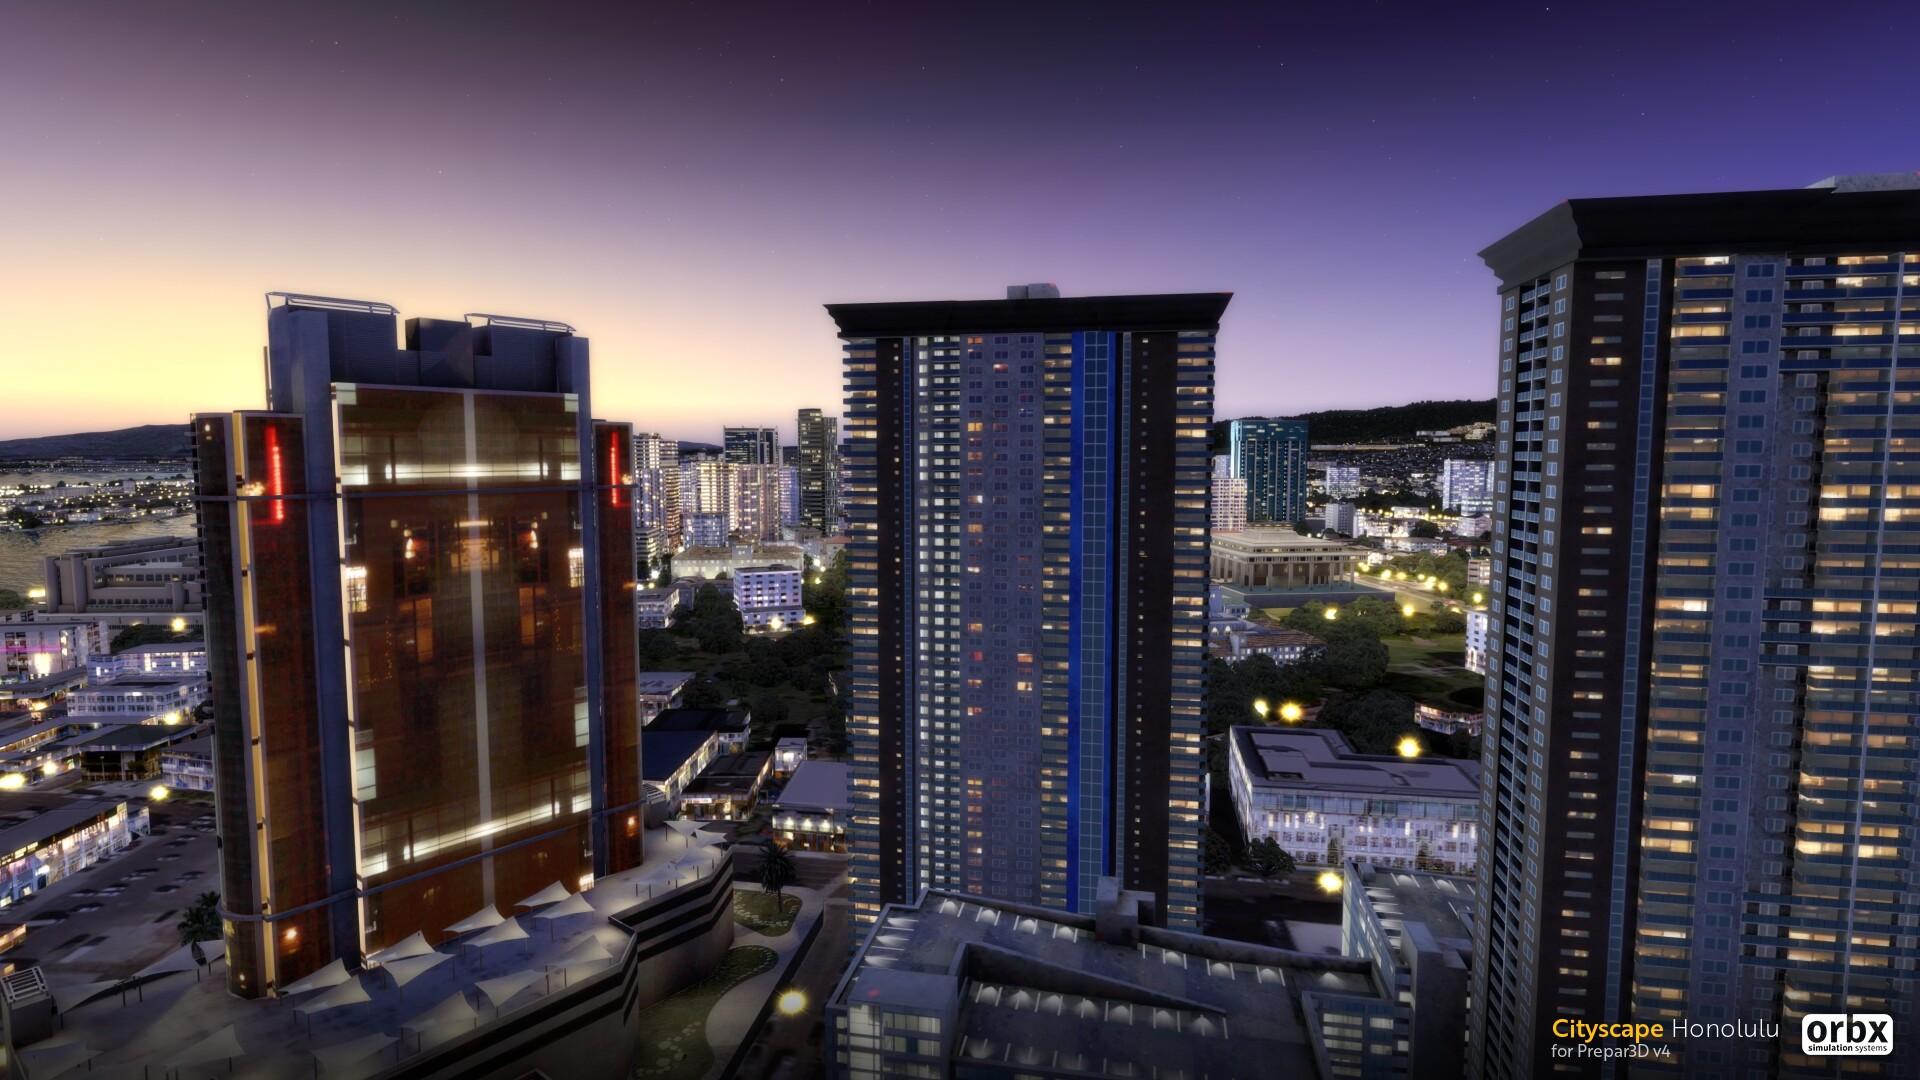 announcement] Aloha! Introducing Cityscape Honolulu for